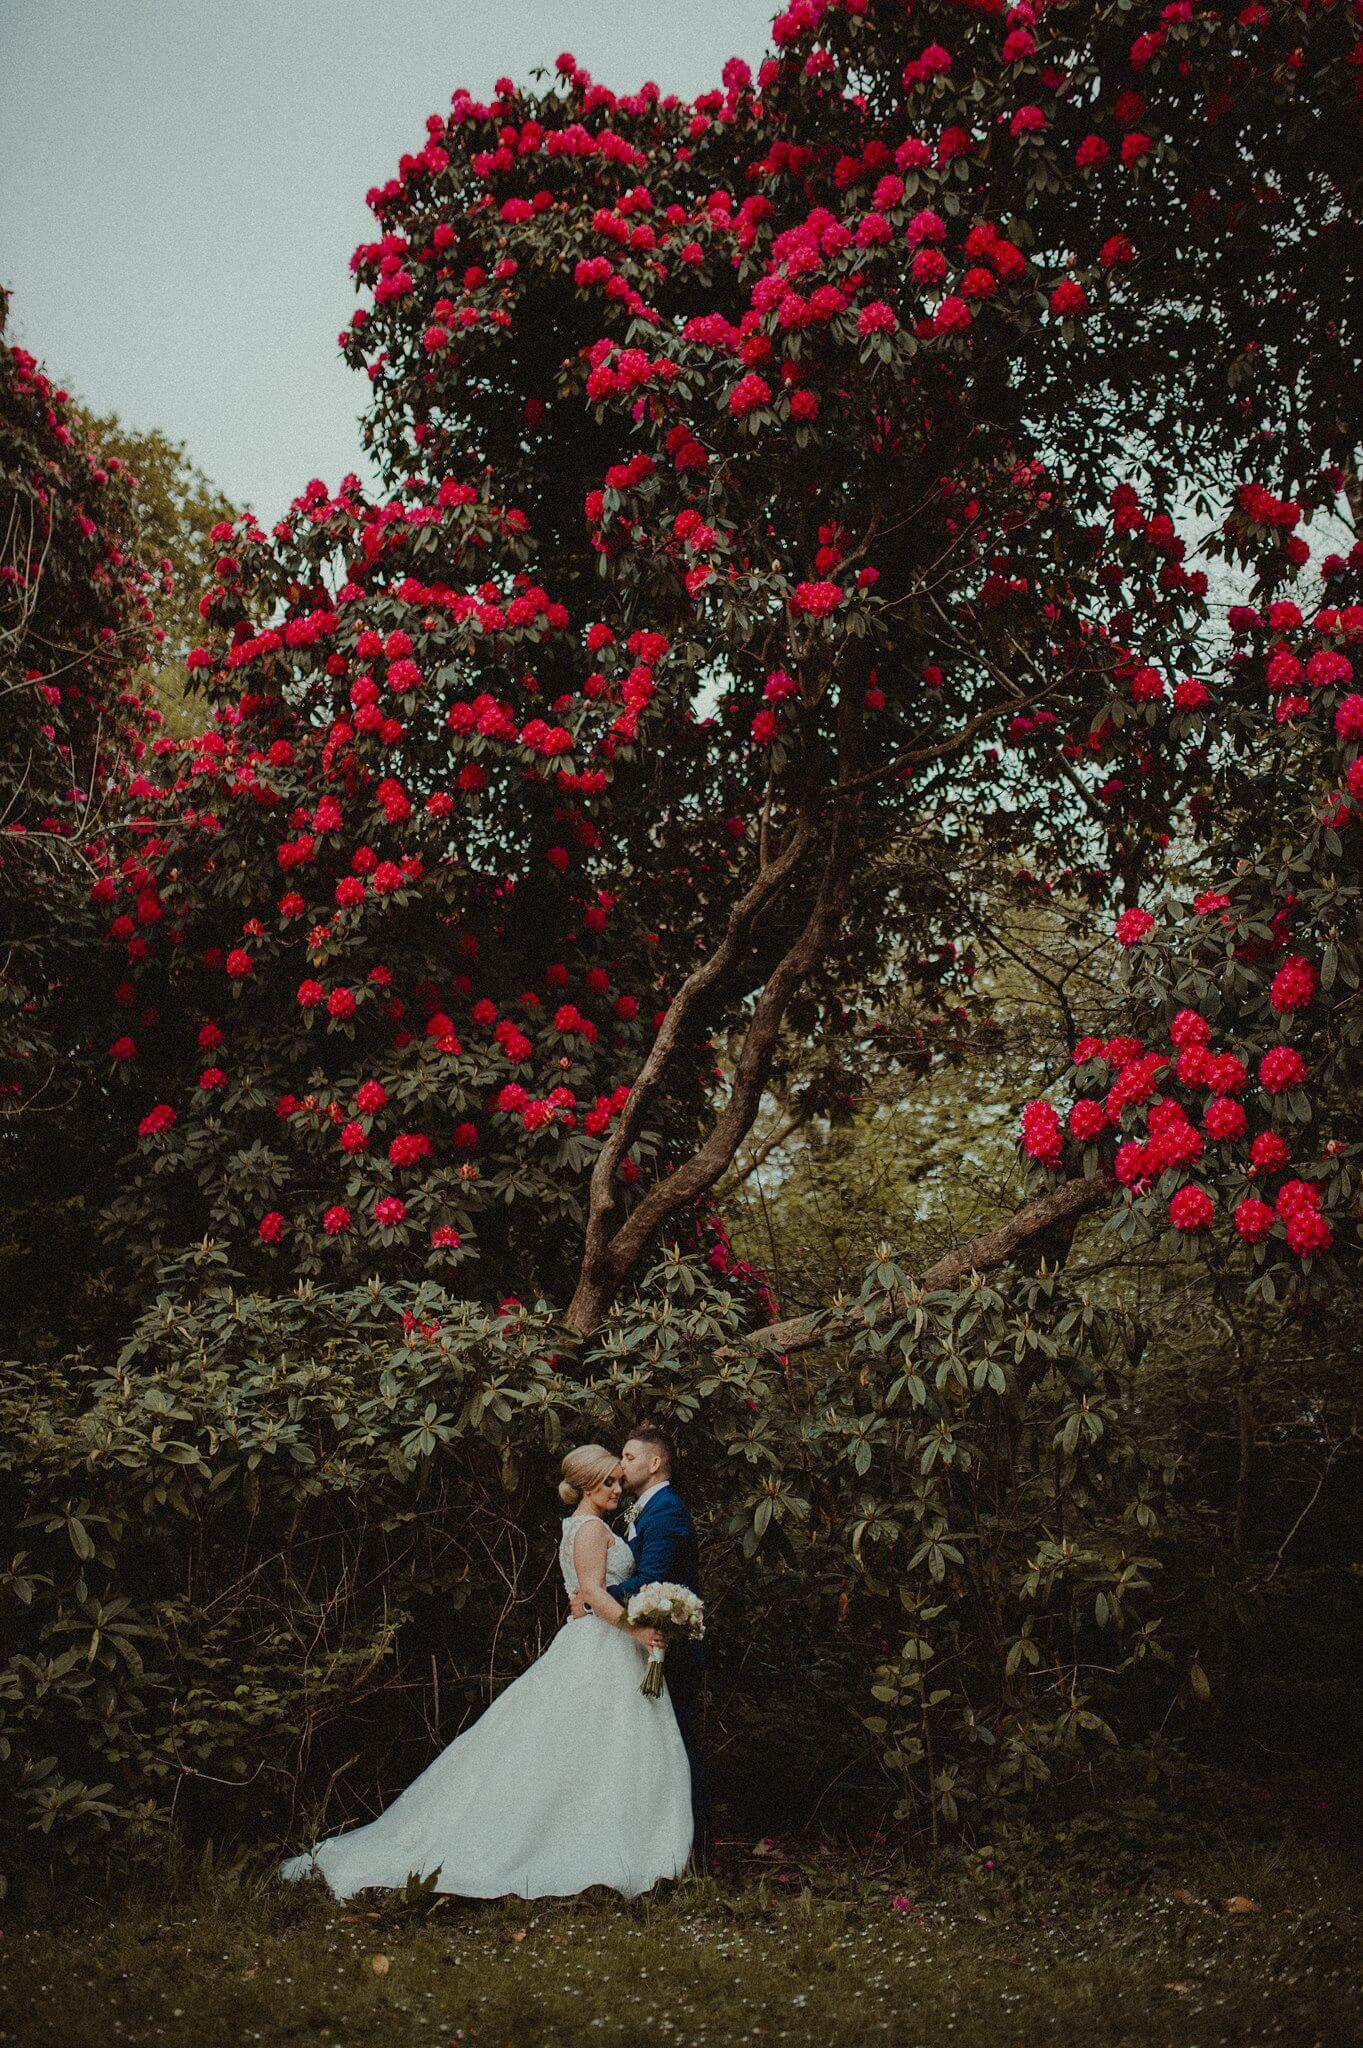 wedding-photographer-and-videographer-bryngarw-house-brynmenyn-bridgend-uk-05